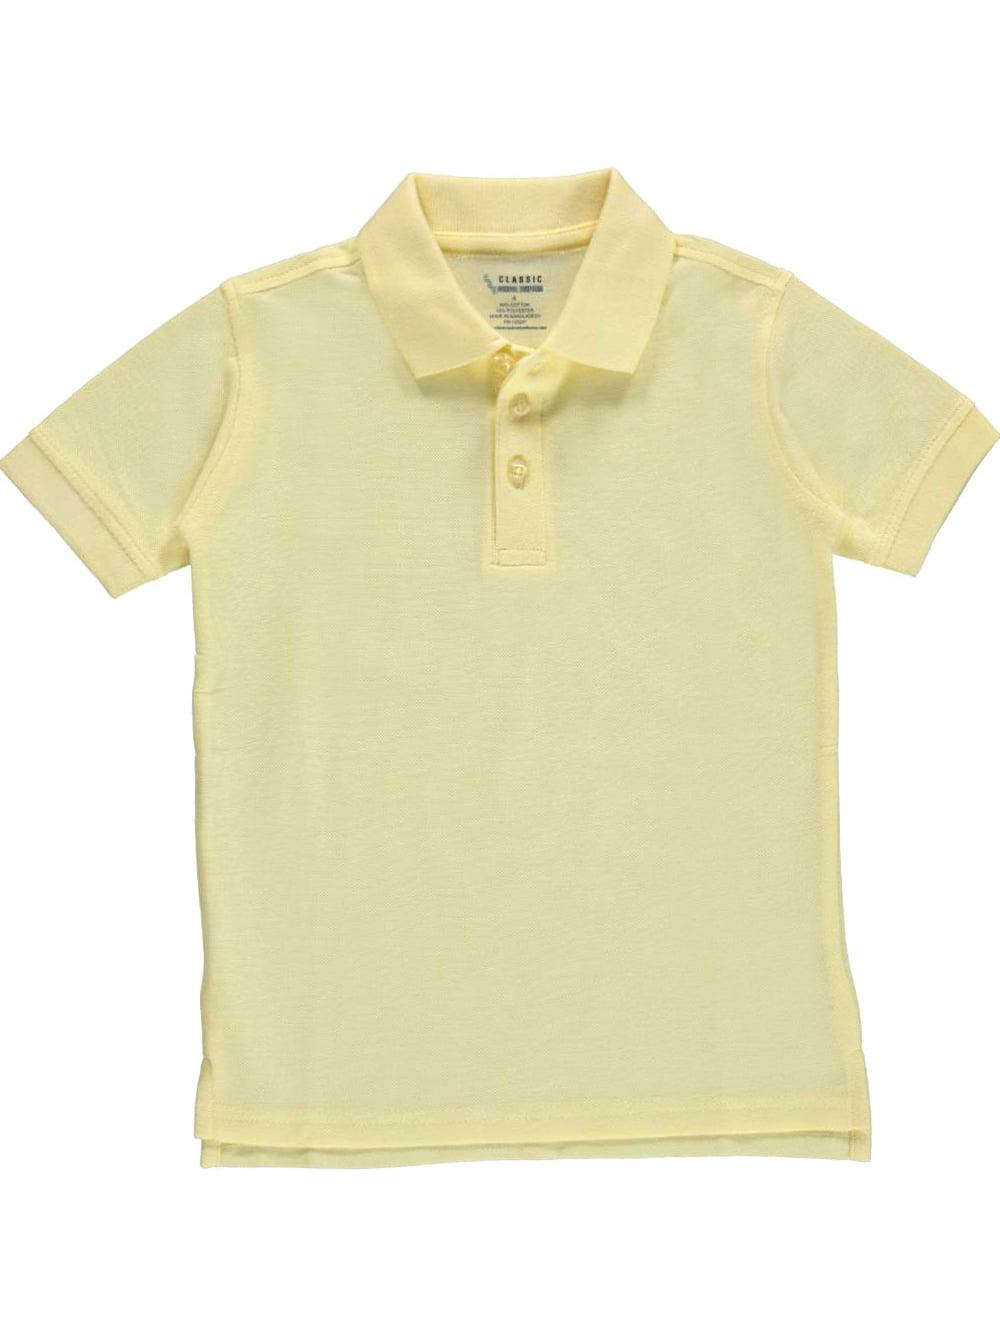 Classic School Uniform Big Boys' Pique Polo (Sizes 8 - 20)